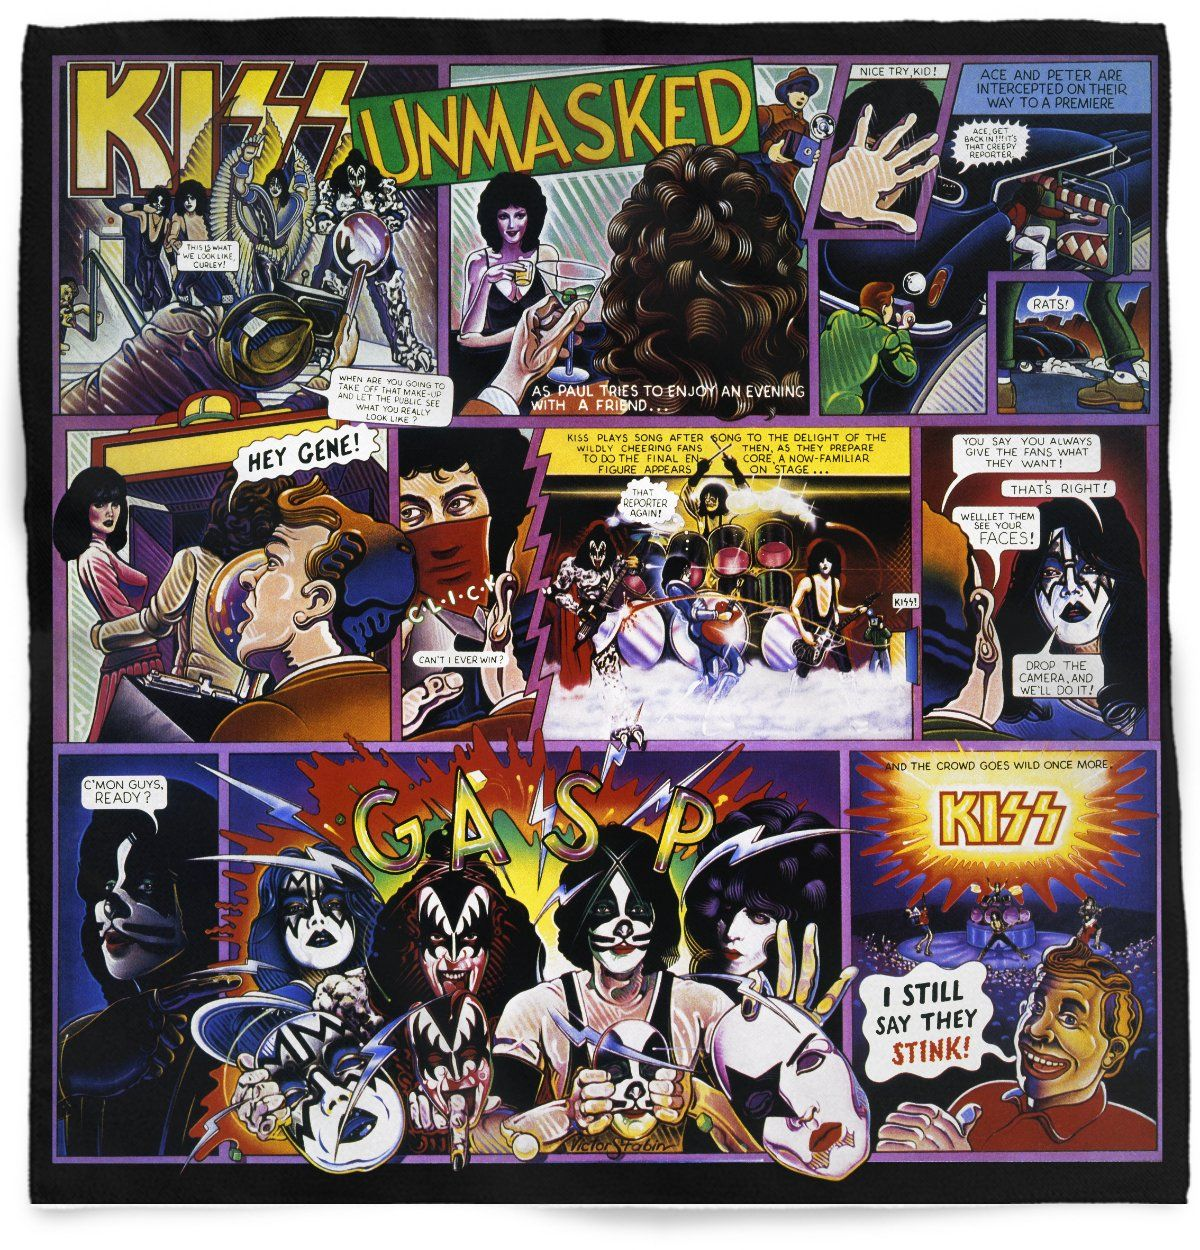 Kiss Unmasked Bandana Album Cover Art Kiss Album Covers Rock